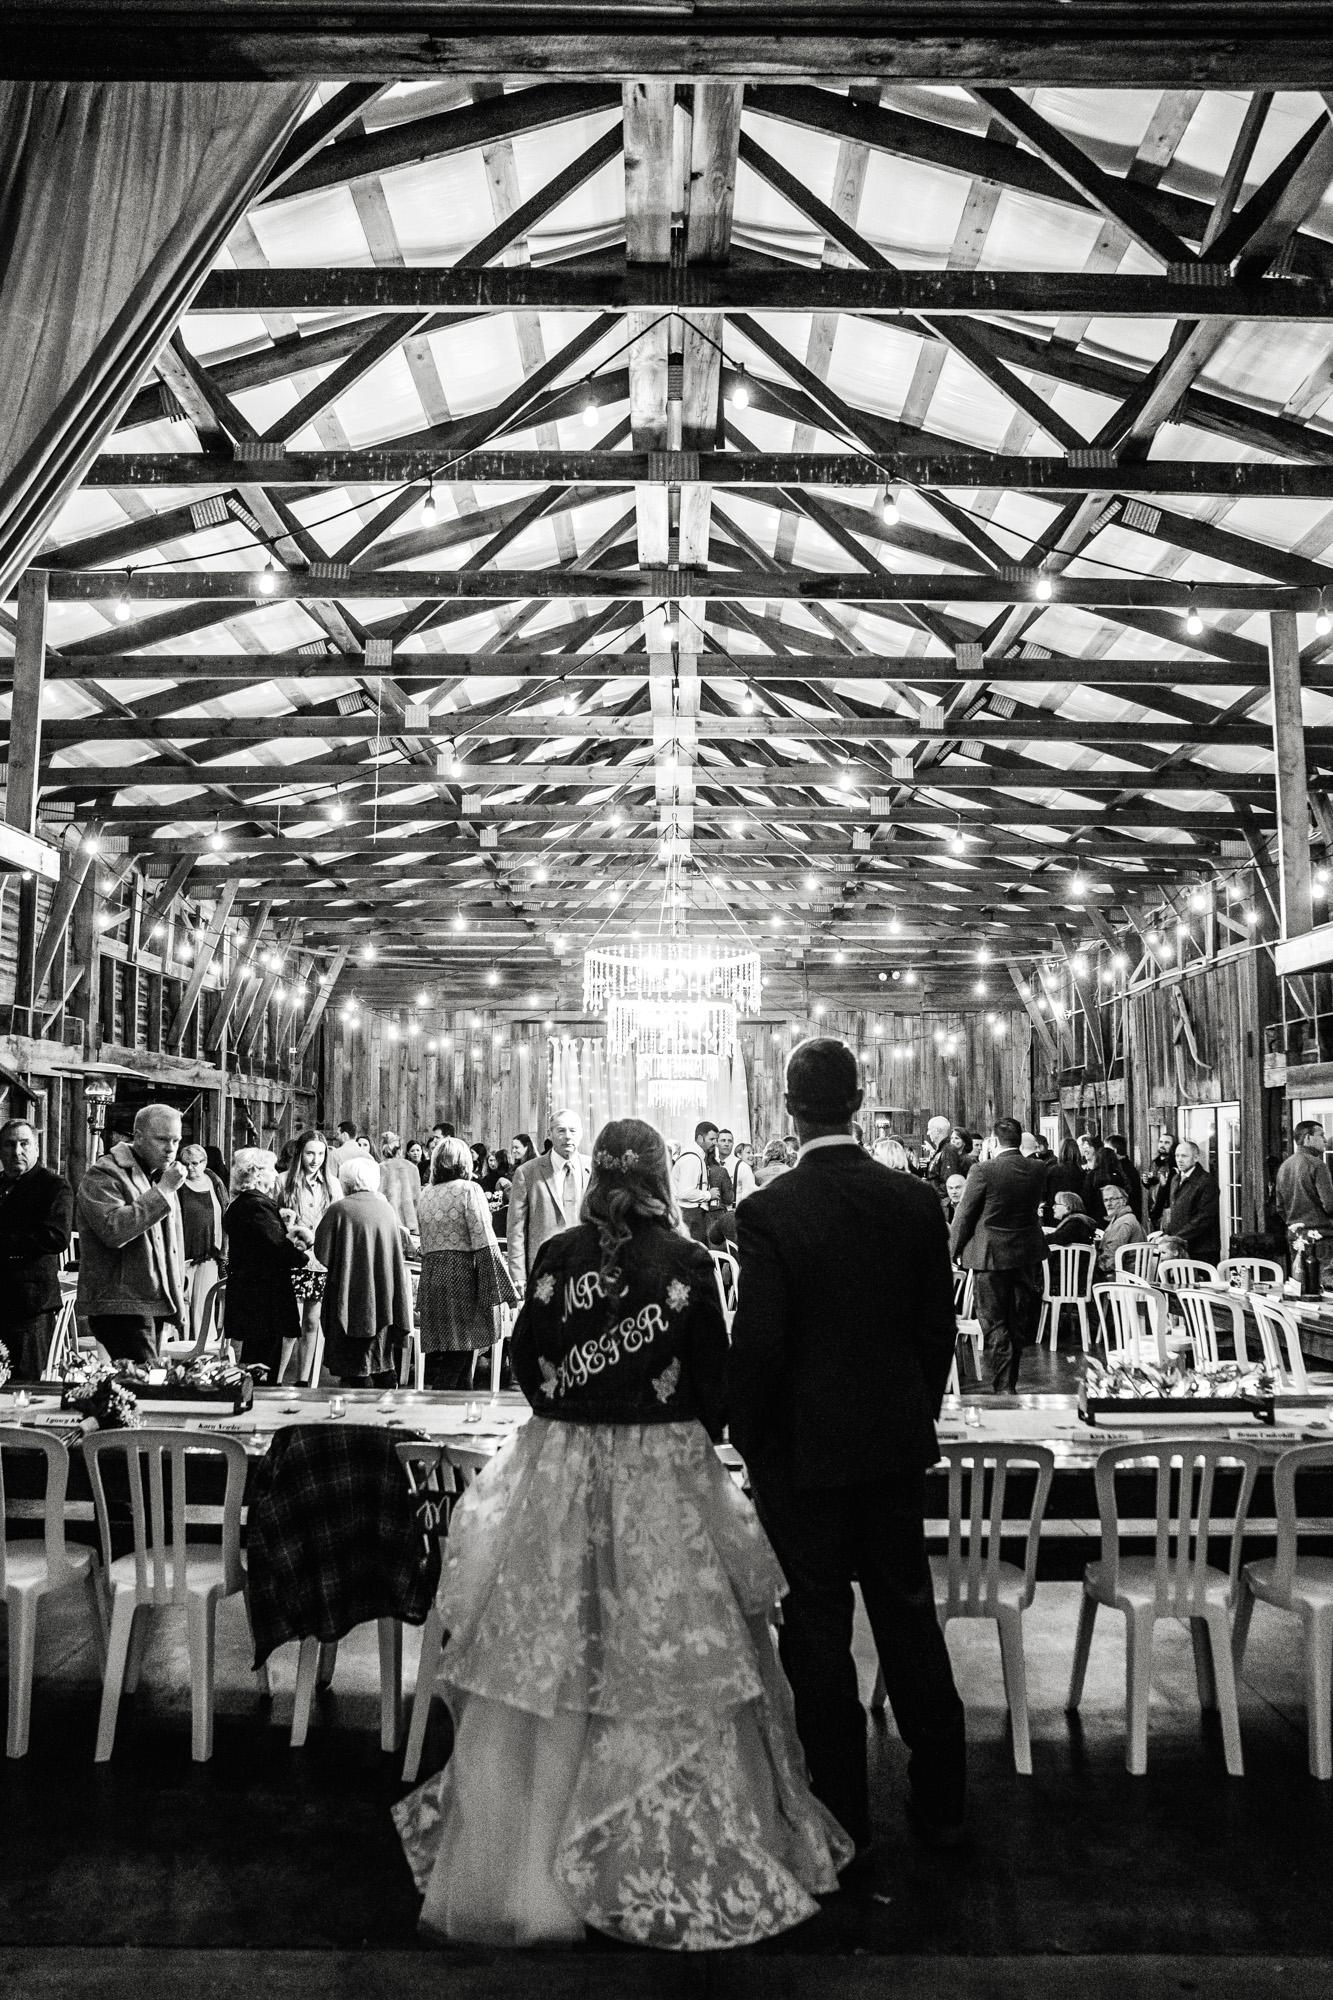 spokane wedding reception image